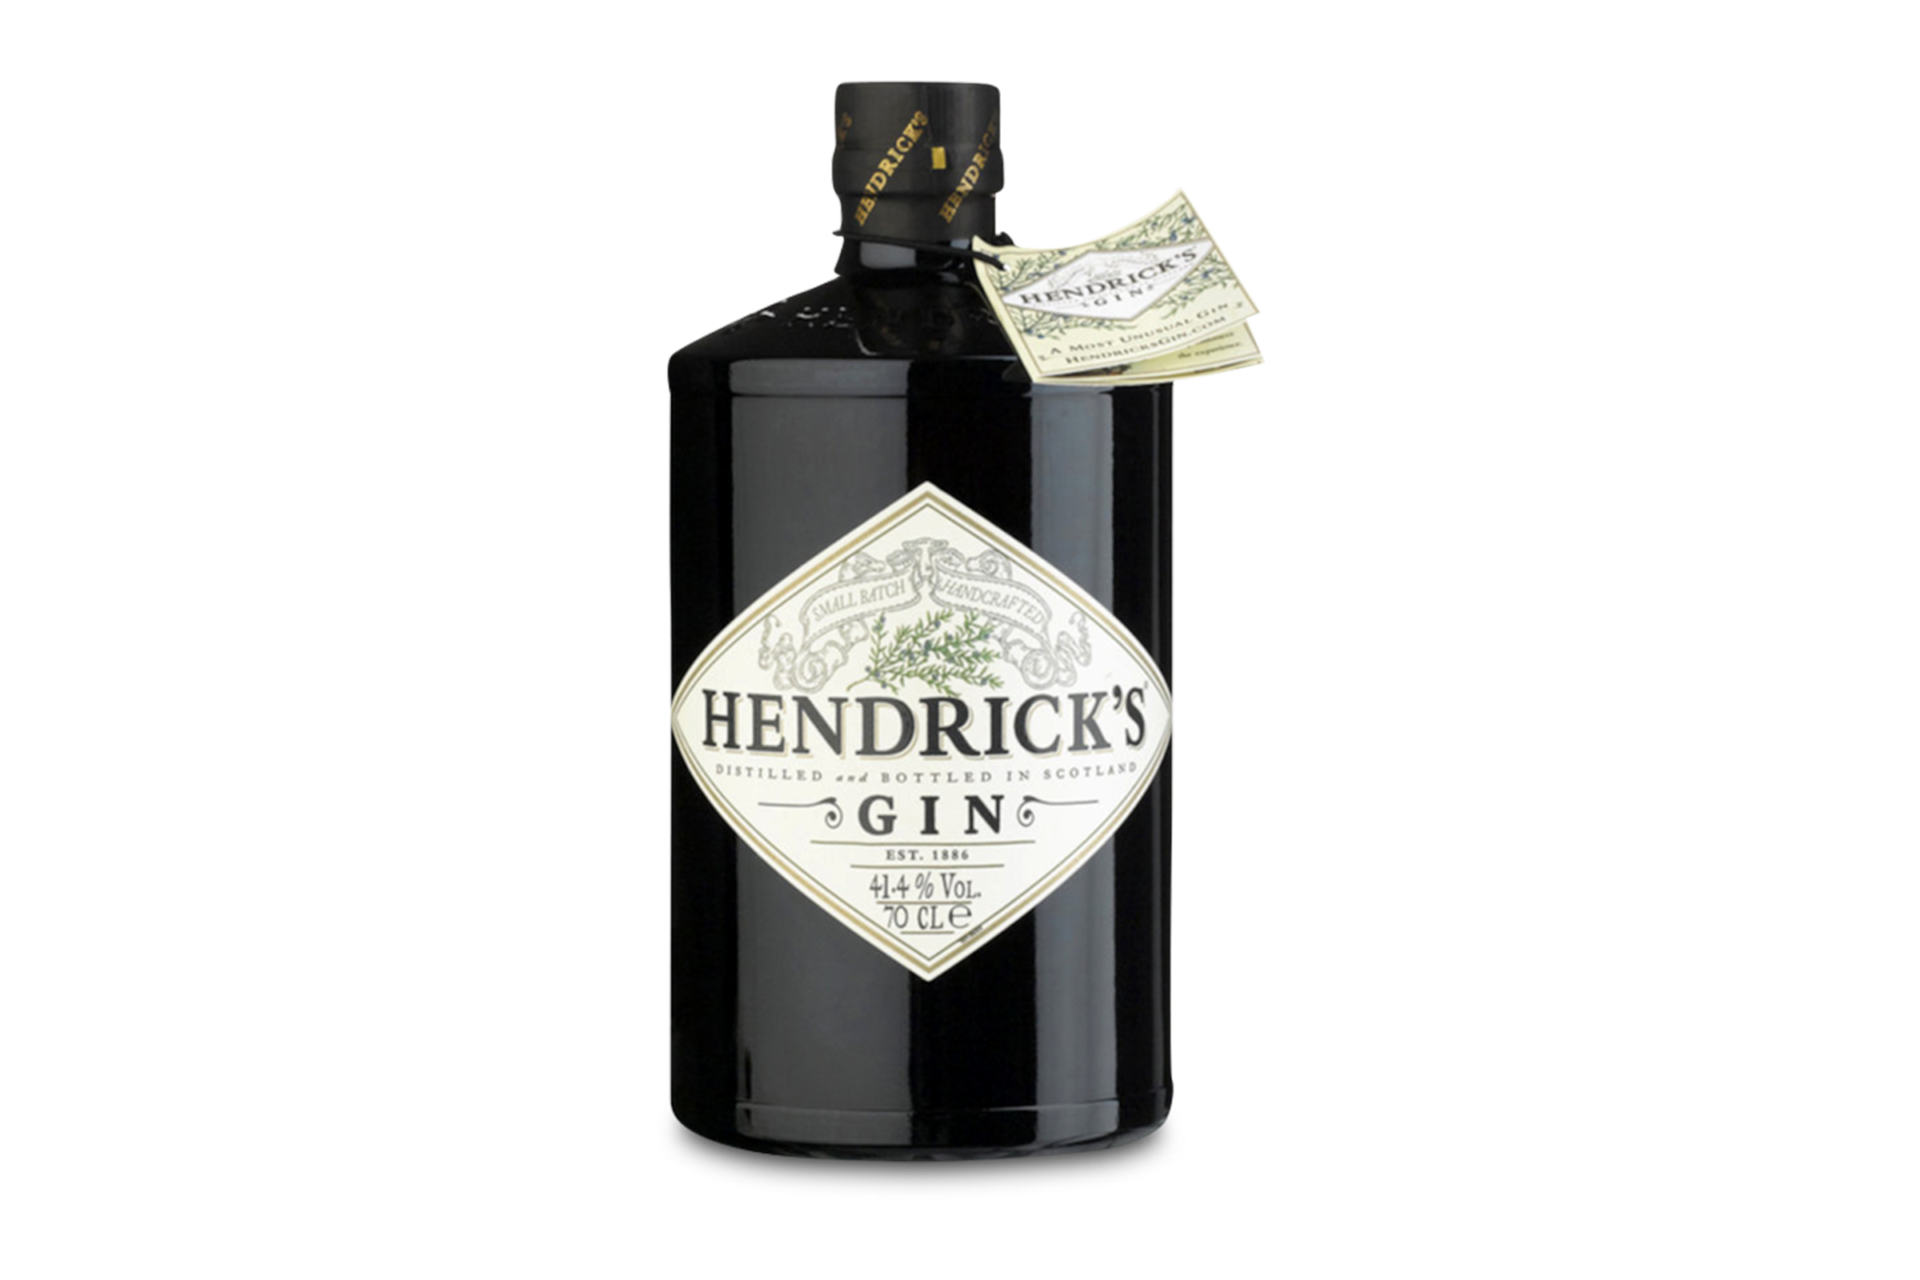 Hendrick's Gin 0.7l 1